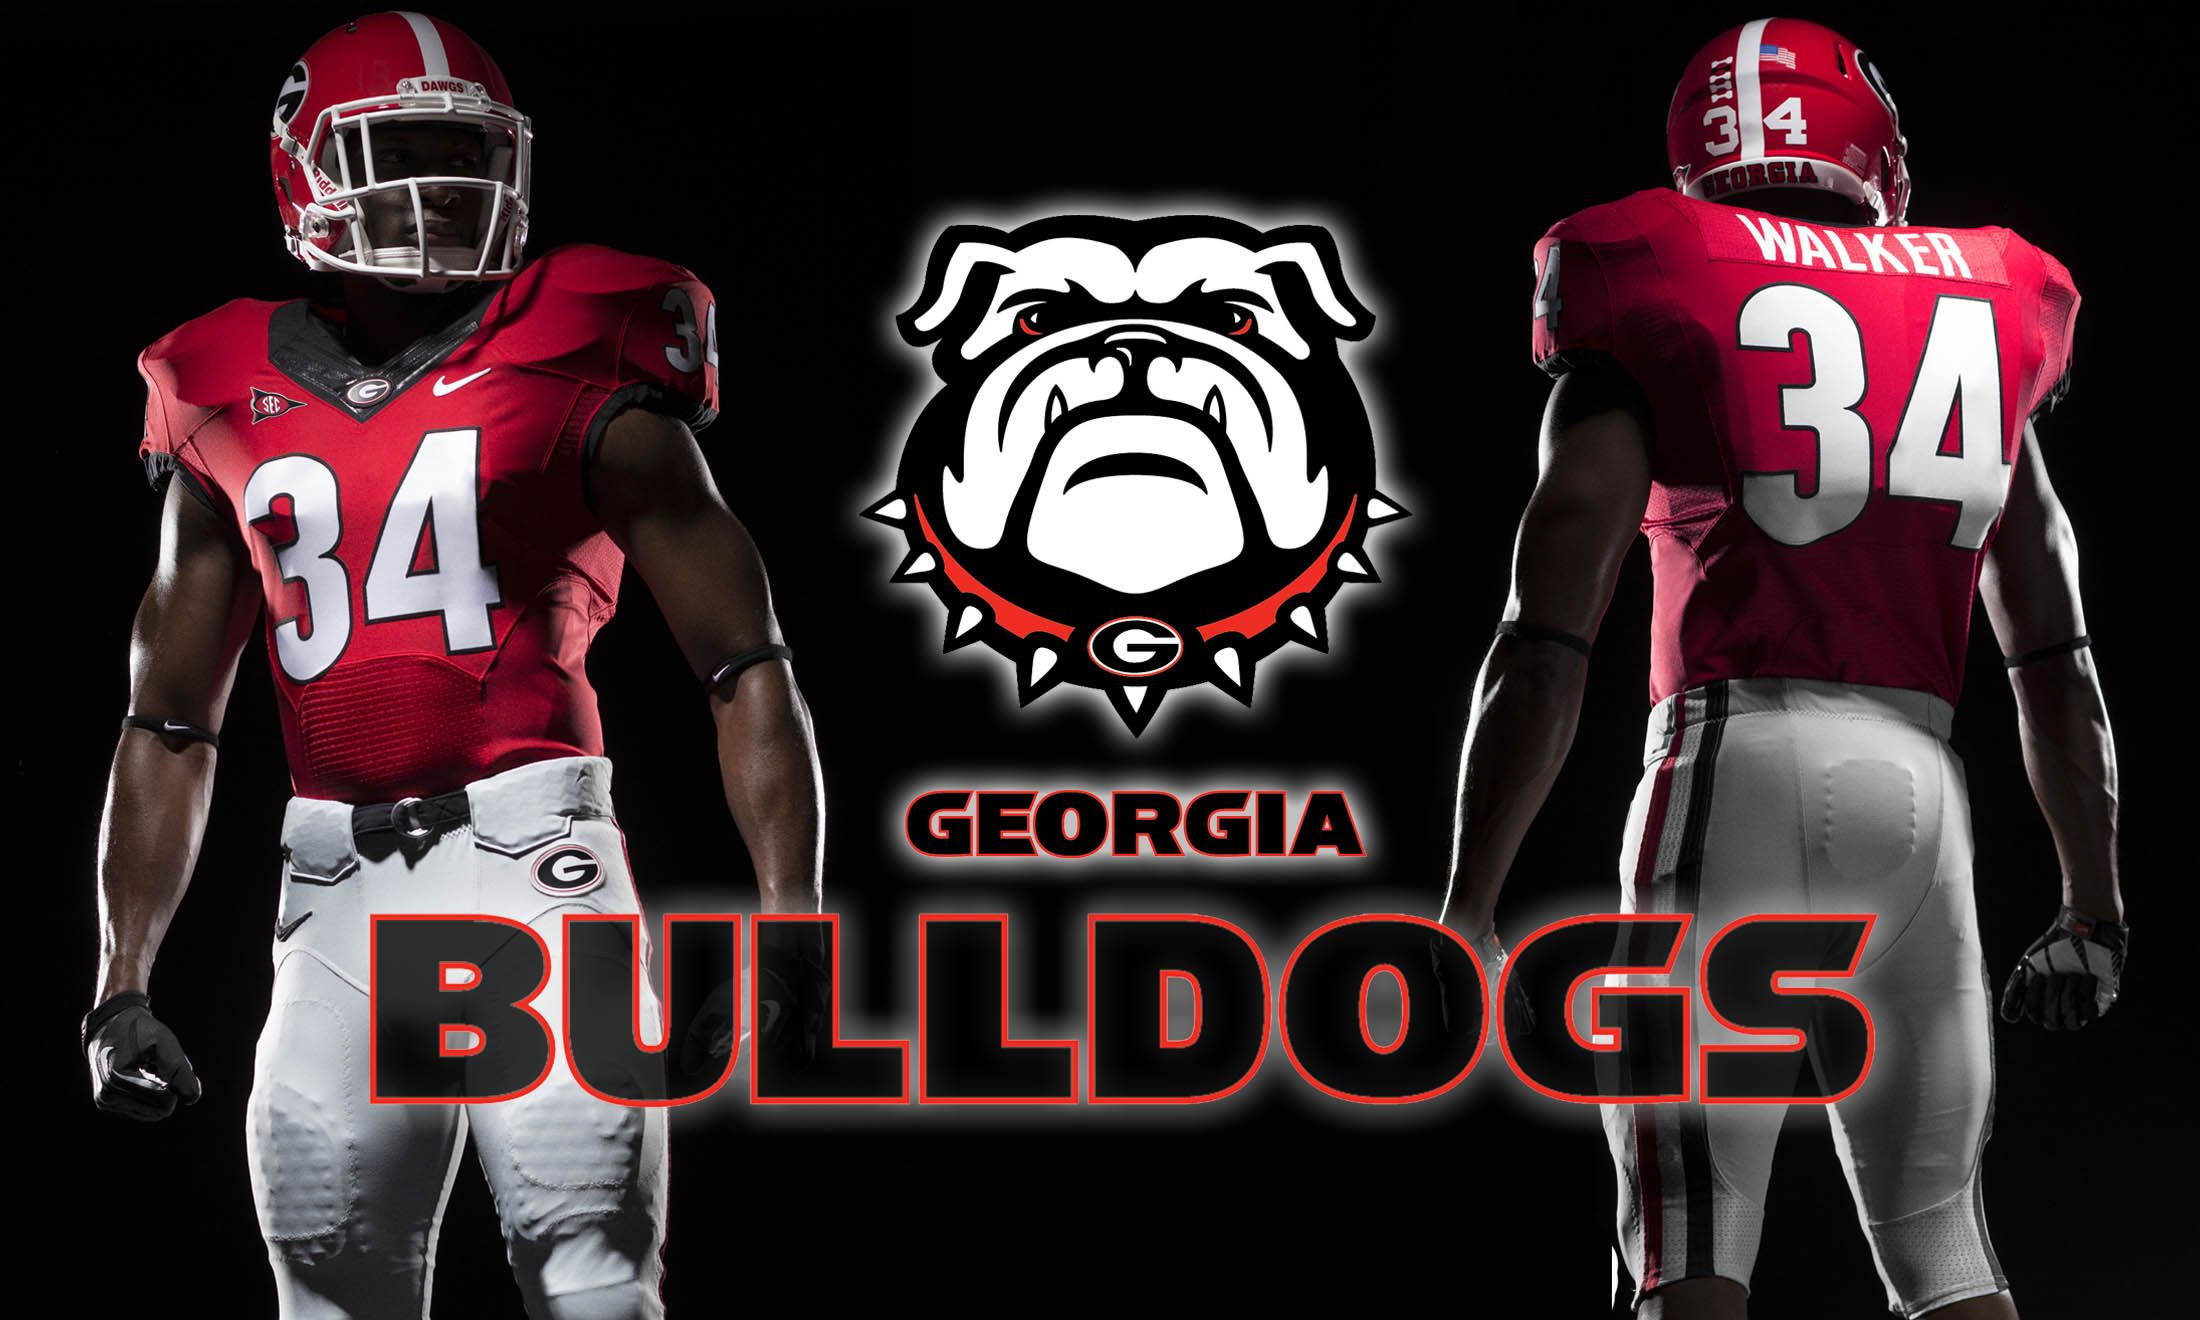 Hd Georgia Bulldogs Wallpaper Best Wallpaper Hd Georgia Bulldogs Football Georgia Bulldogs Bulldog Wallpaper